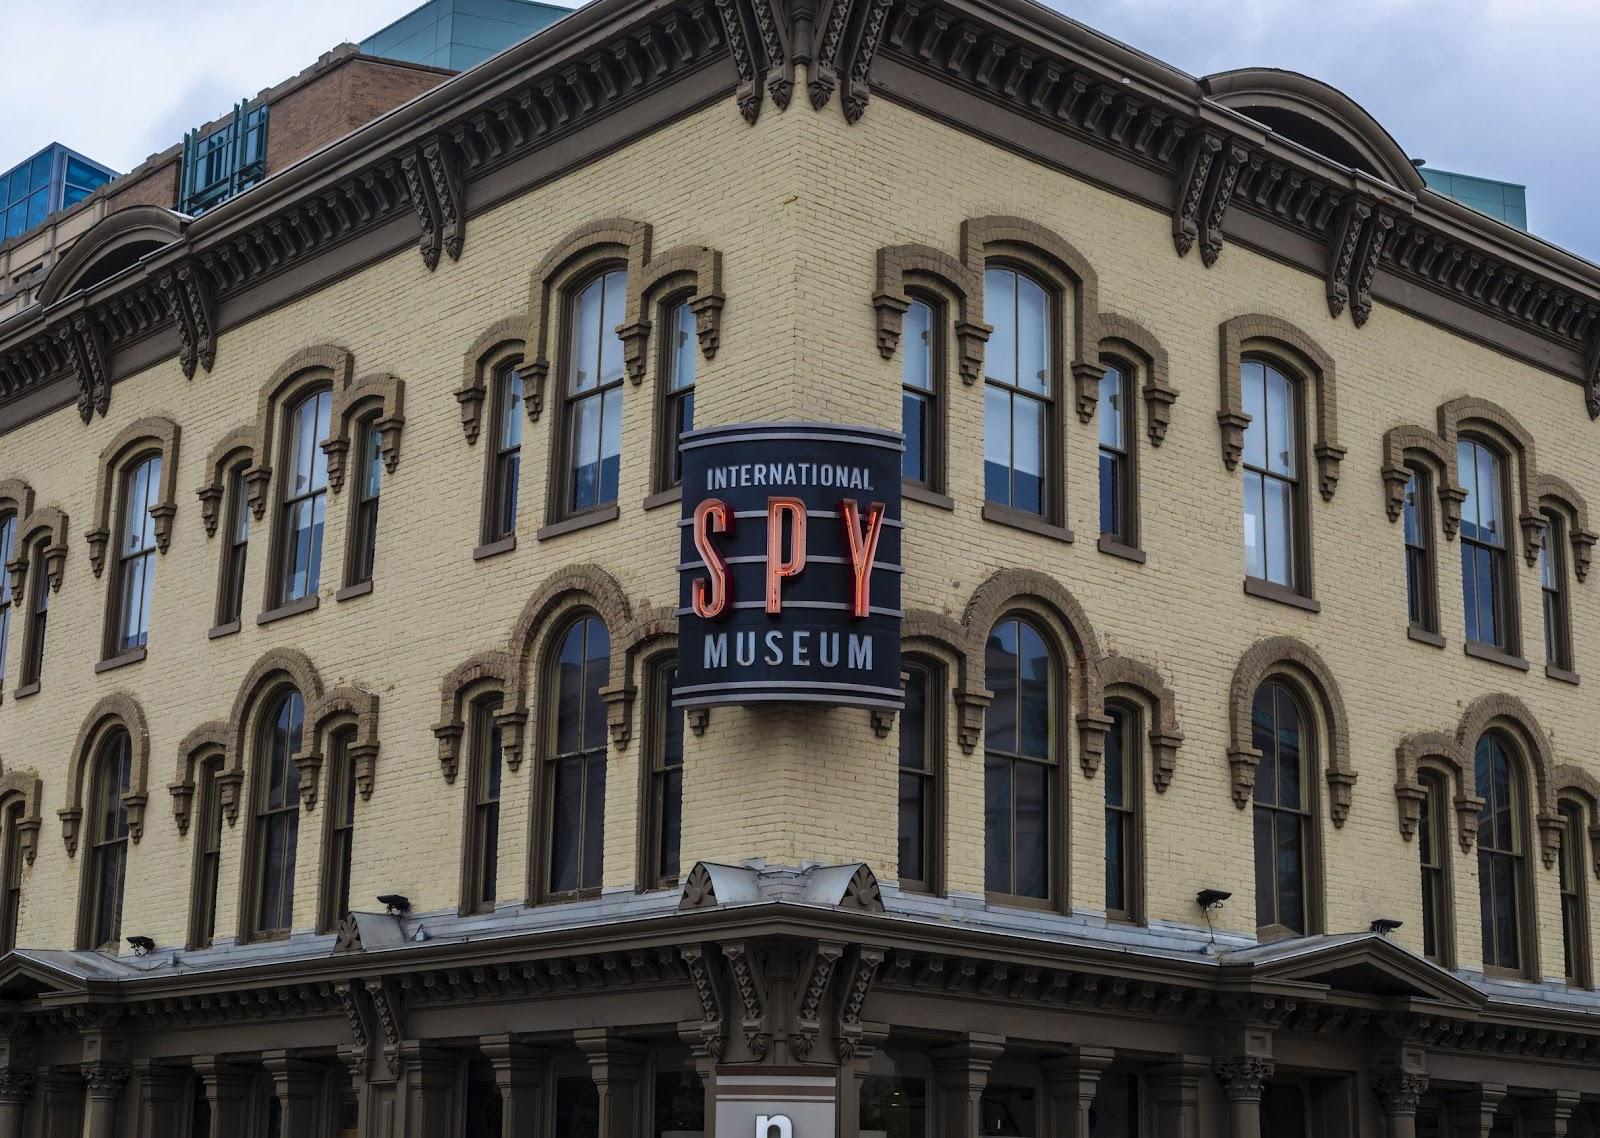 The International Spy museum in Washington, D.C.